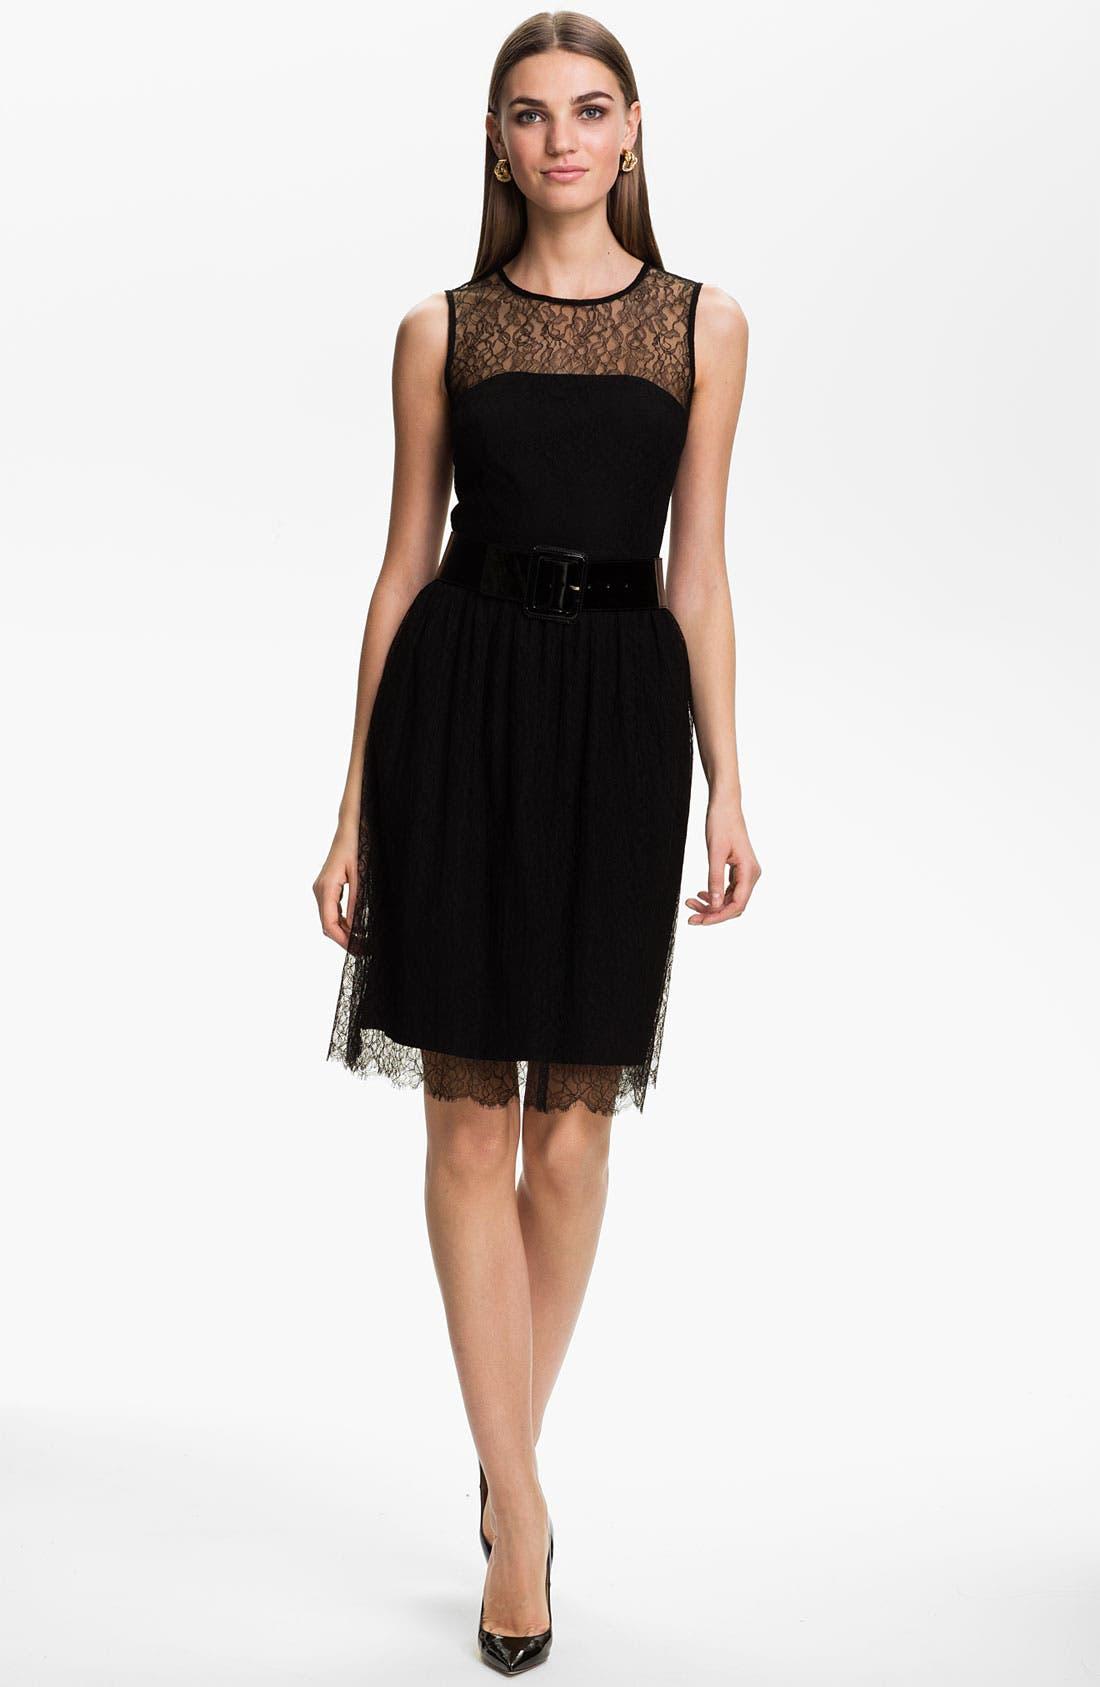 Main Image - St. John Collection Sleeveless Chantilly Lace Dress